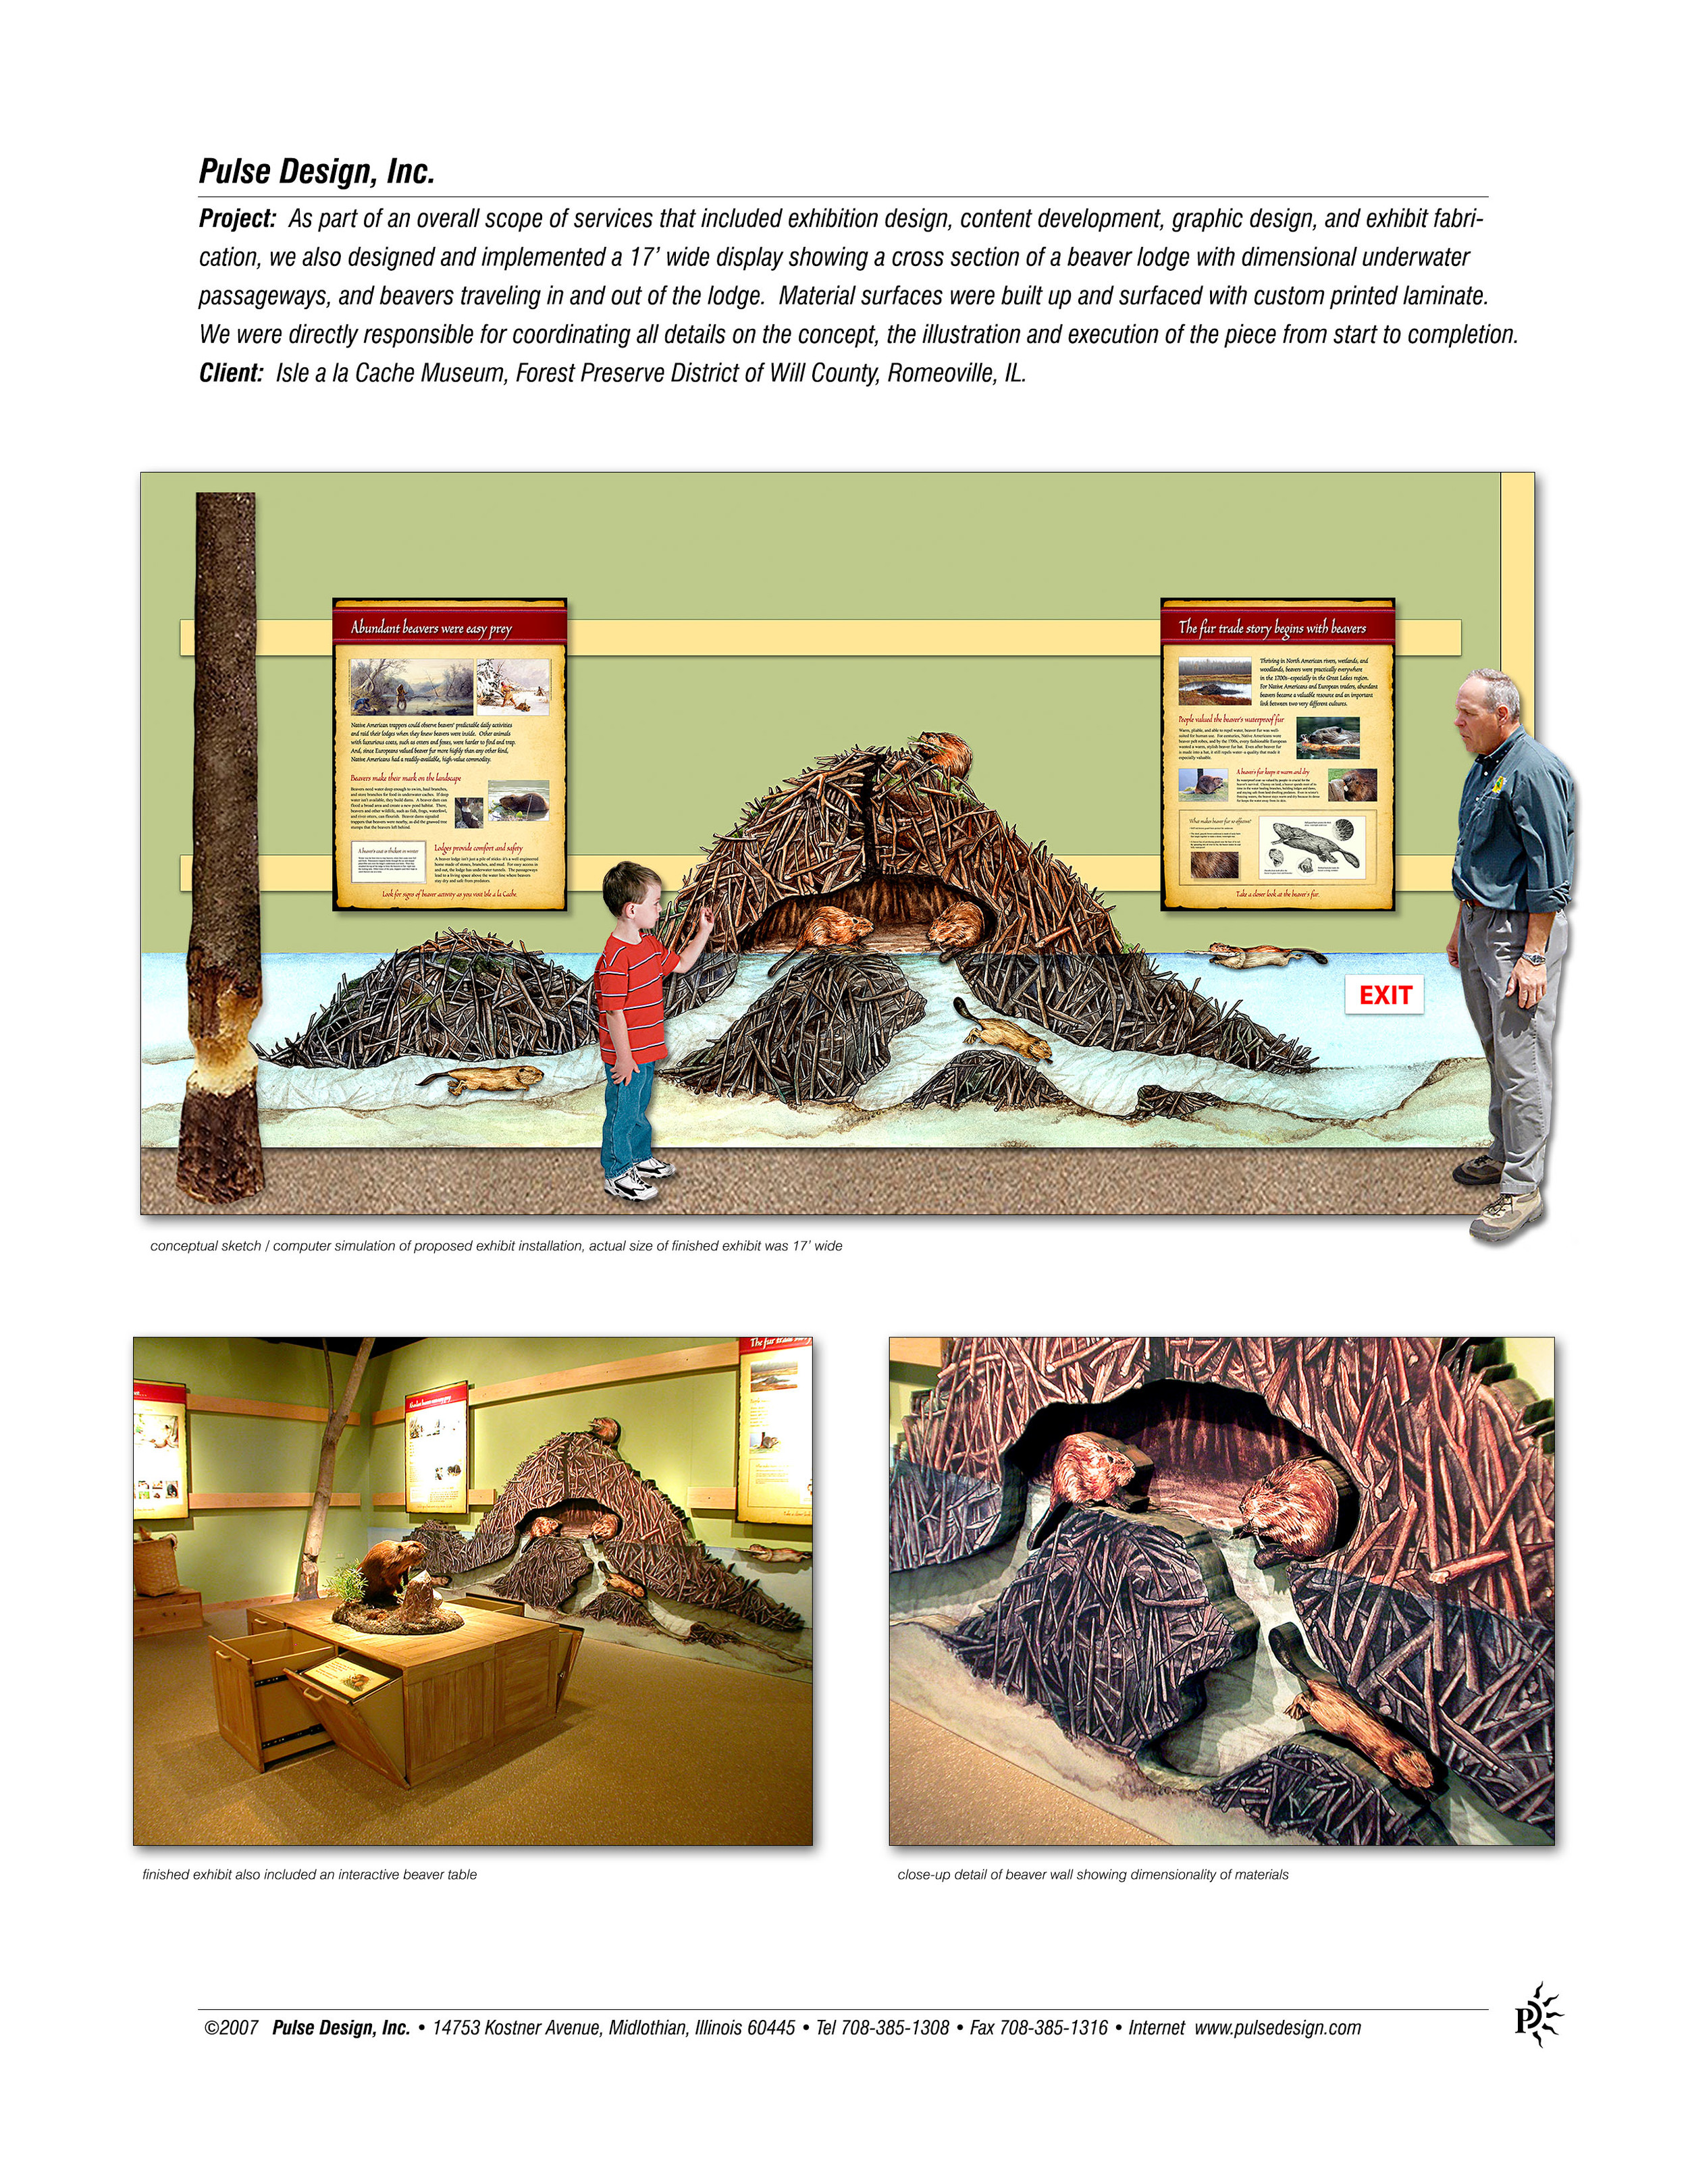 Isla-a-la-Cache-Exhibit-Beaver-Pulse-Design-Inc.jpg